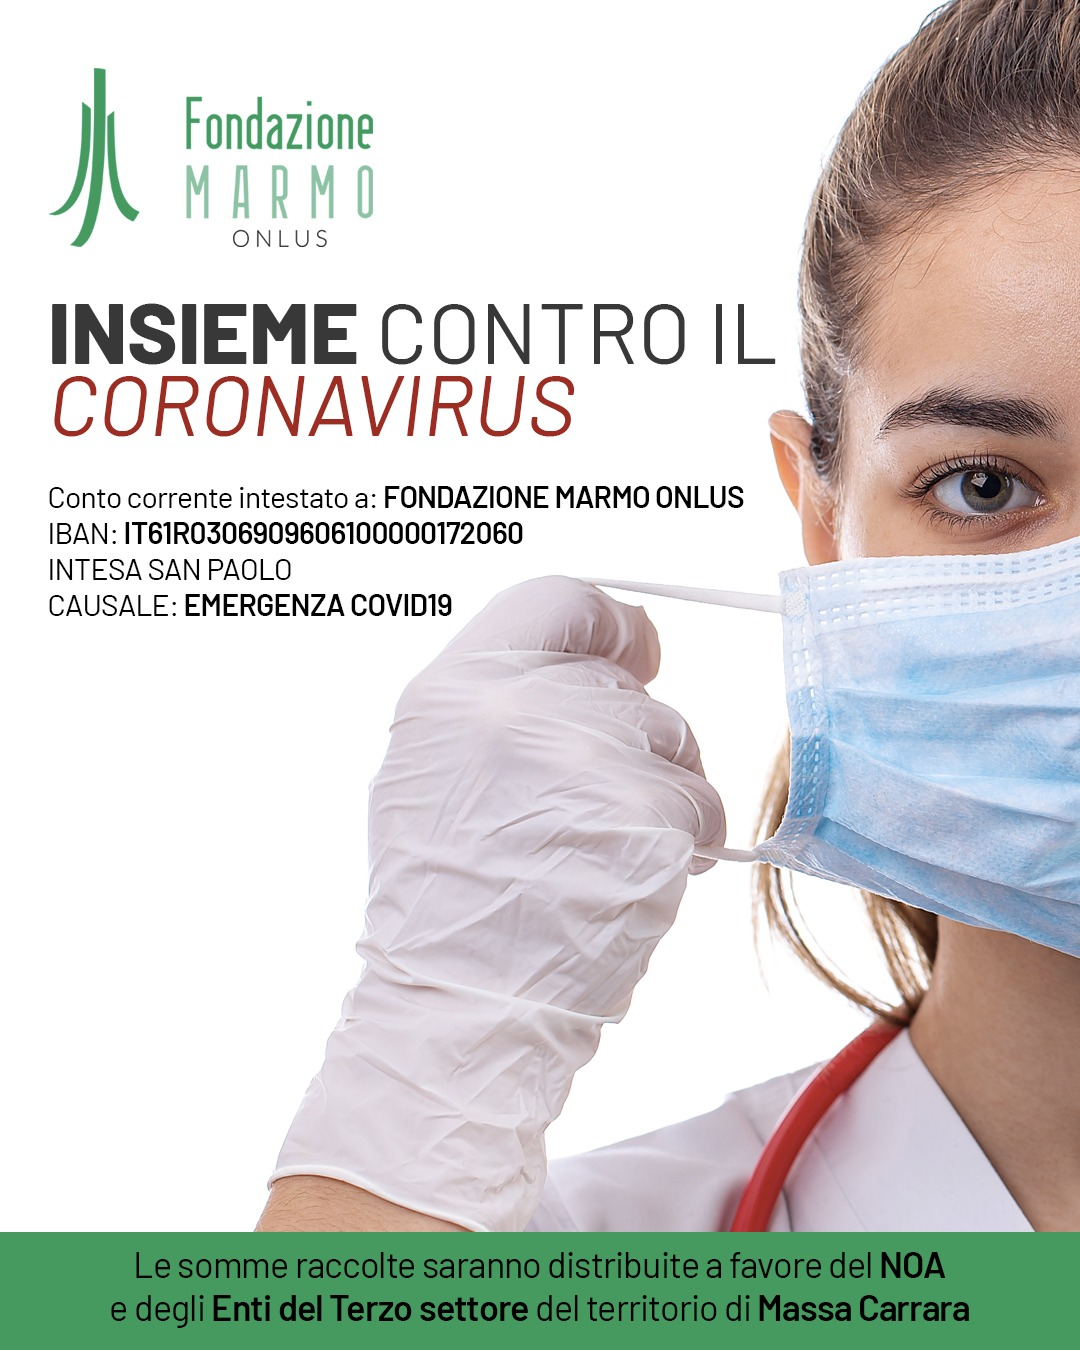 Insieme contro il coronavirus